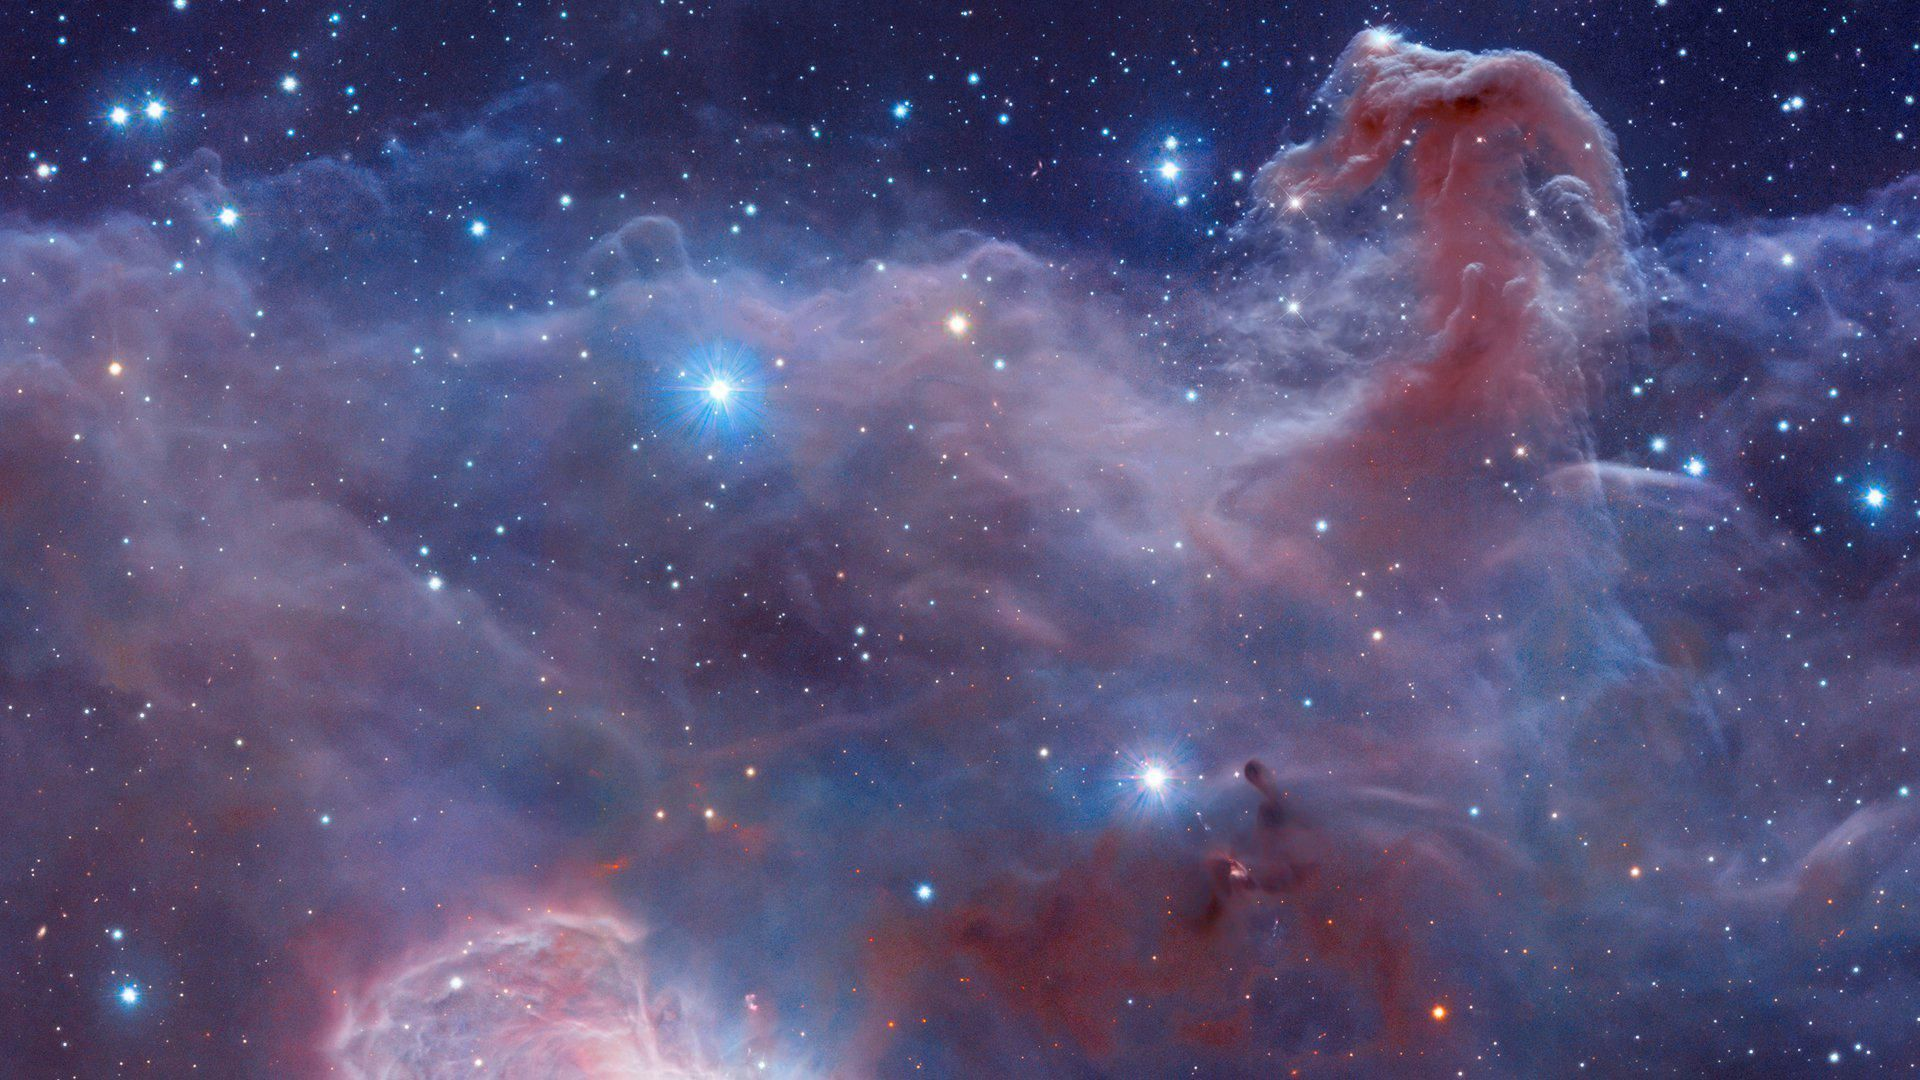 Download Wallpaper Horse Nebula - 0d4539db5efed8c52016146580e23e87  Perfect Image Reference_7937.jpg